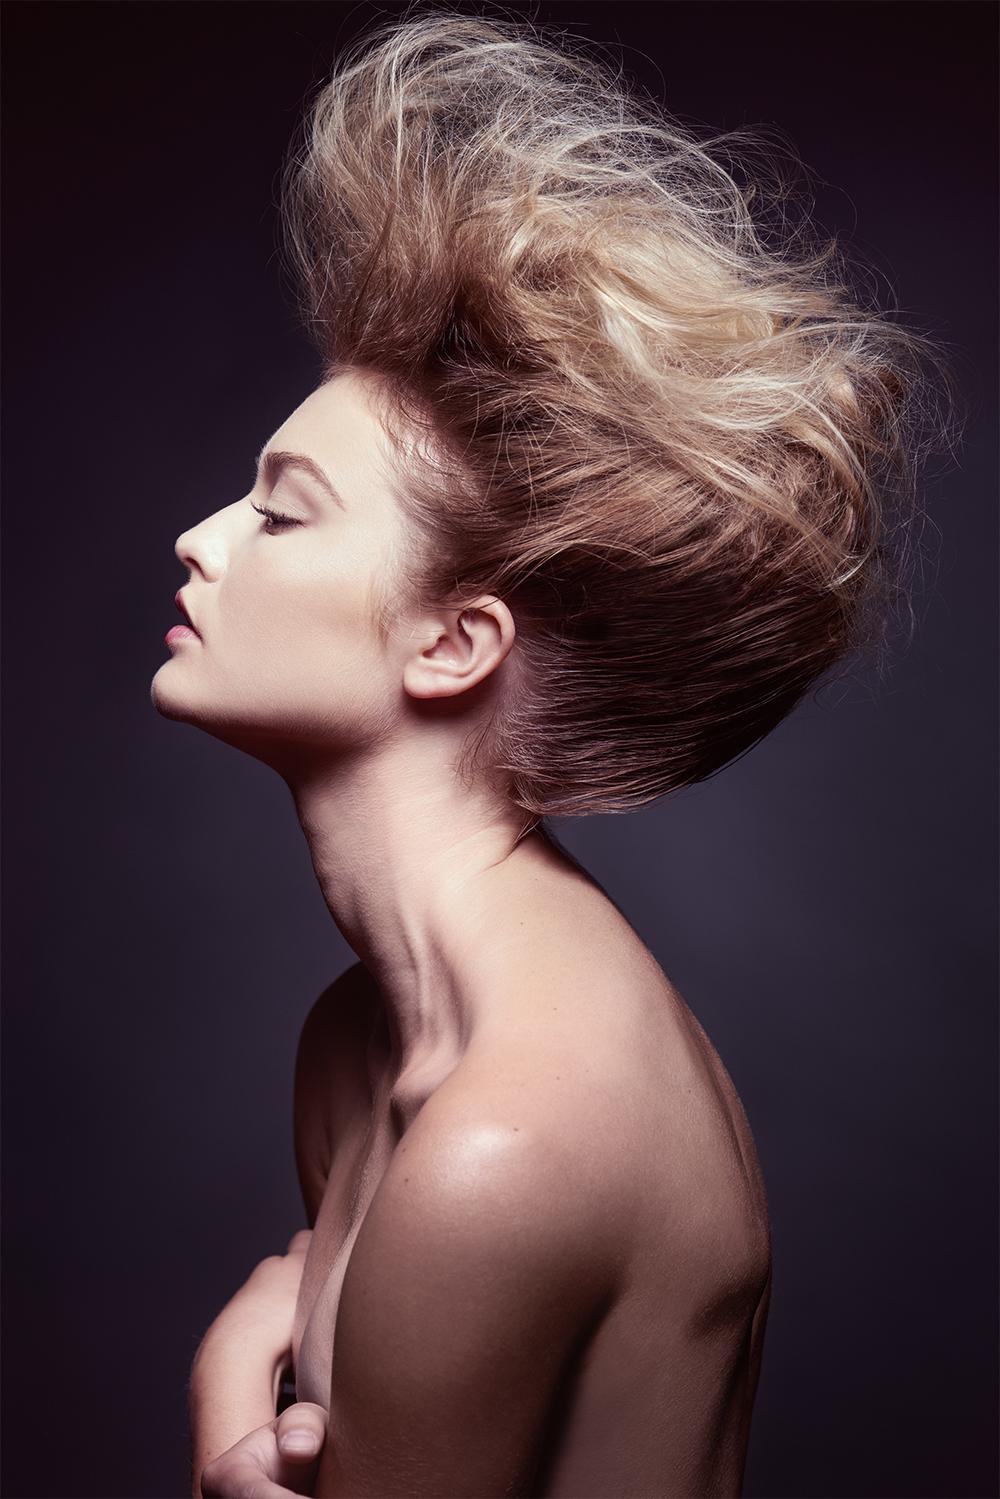 patrick_tak_seattle_photographer_commercial_beauty_indi3.jpg